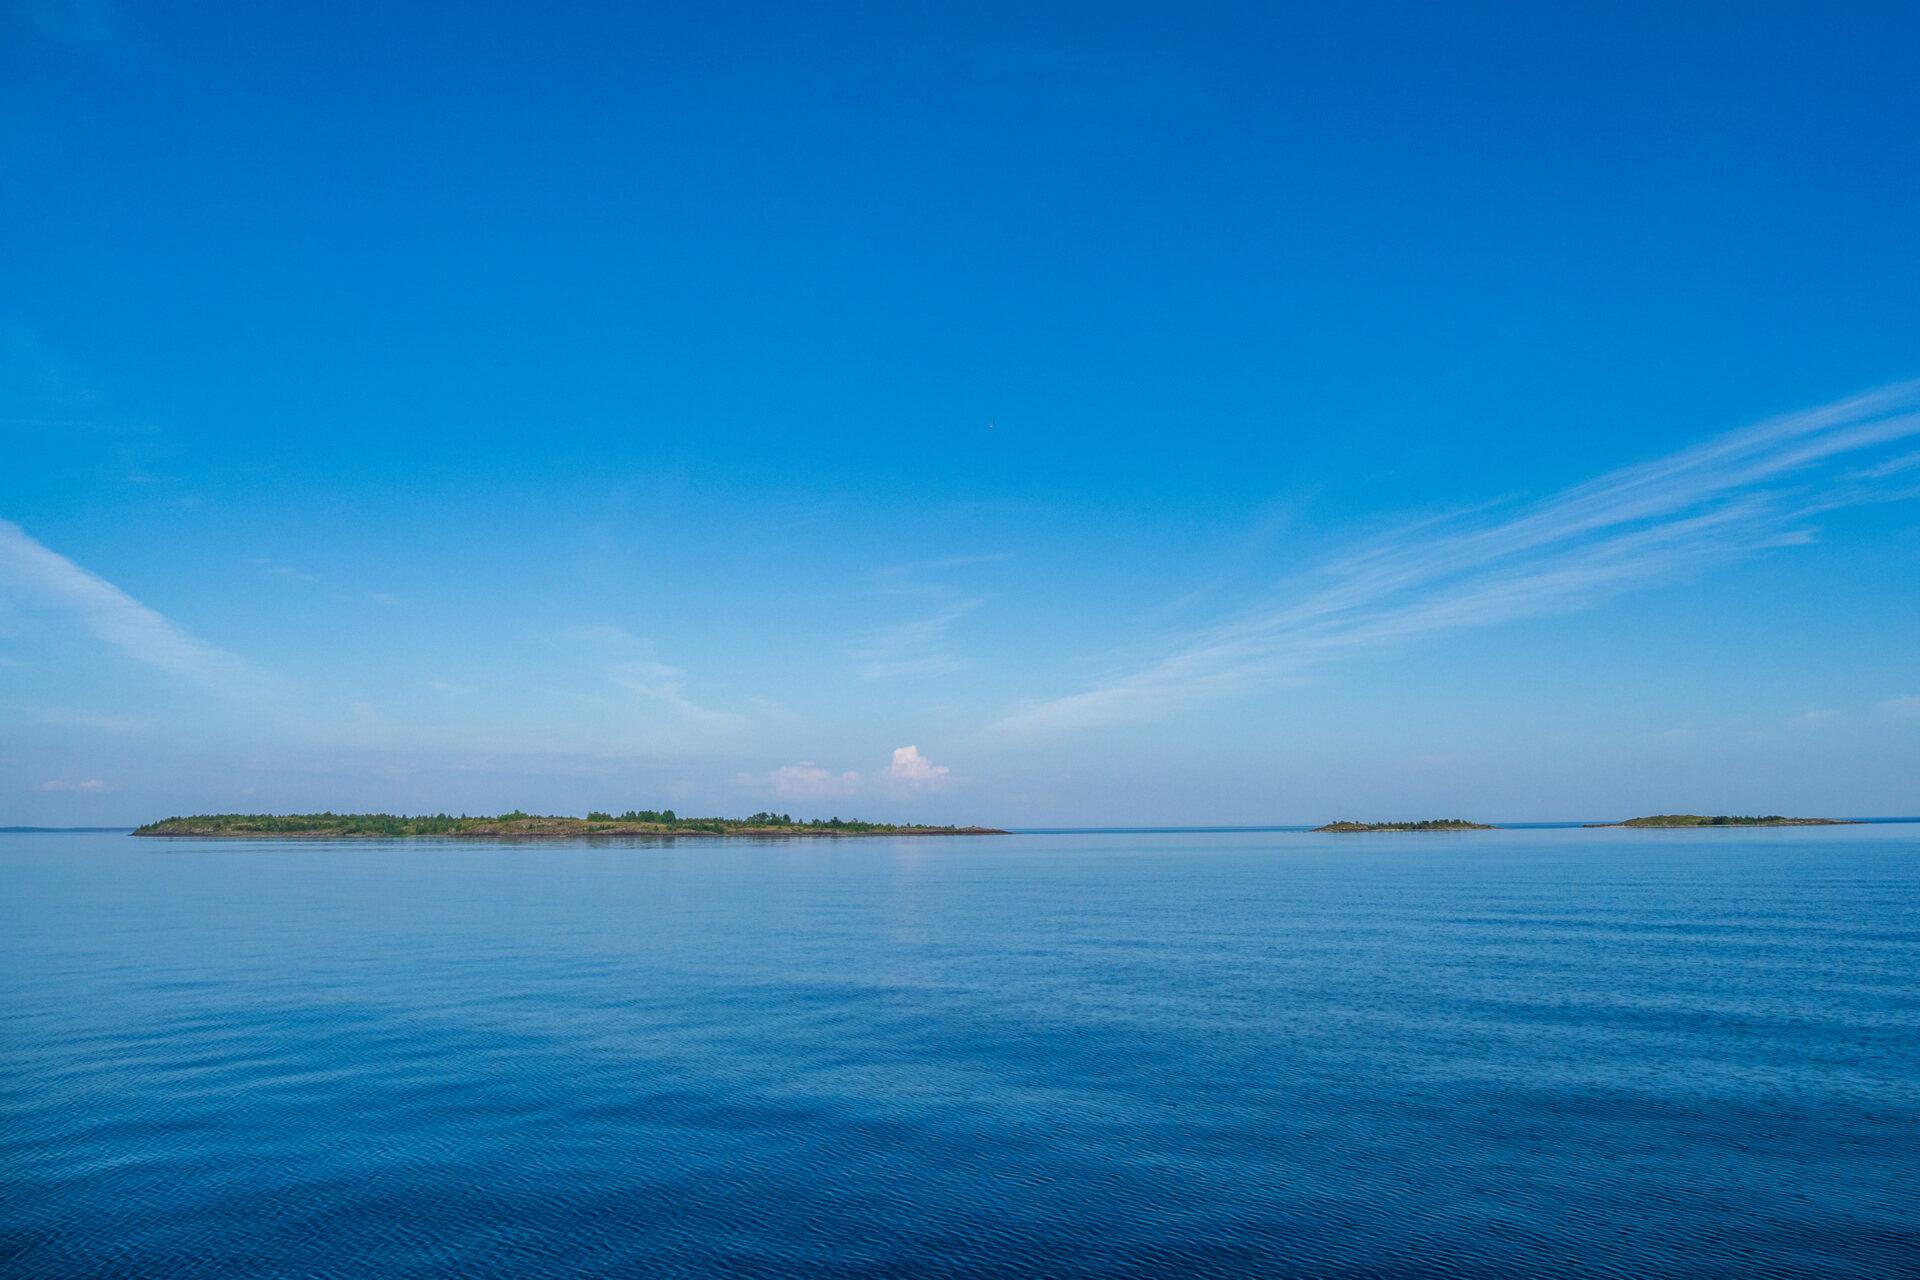 Карелия. Остров Валаам. Лето 2019